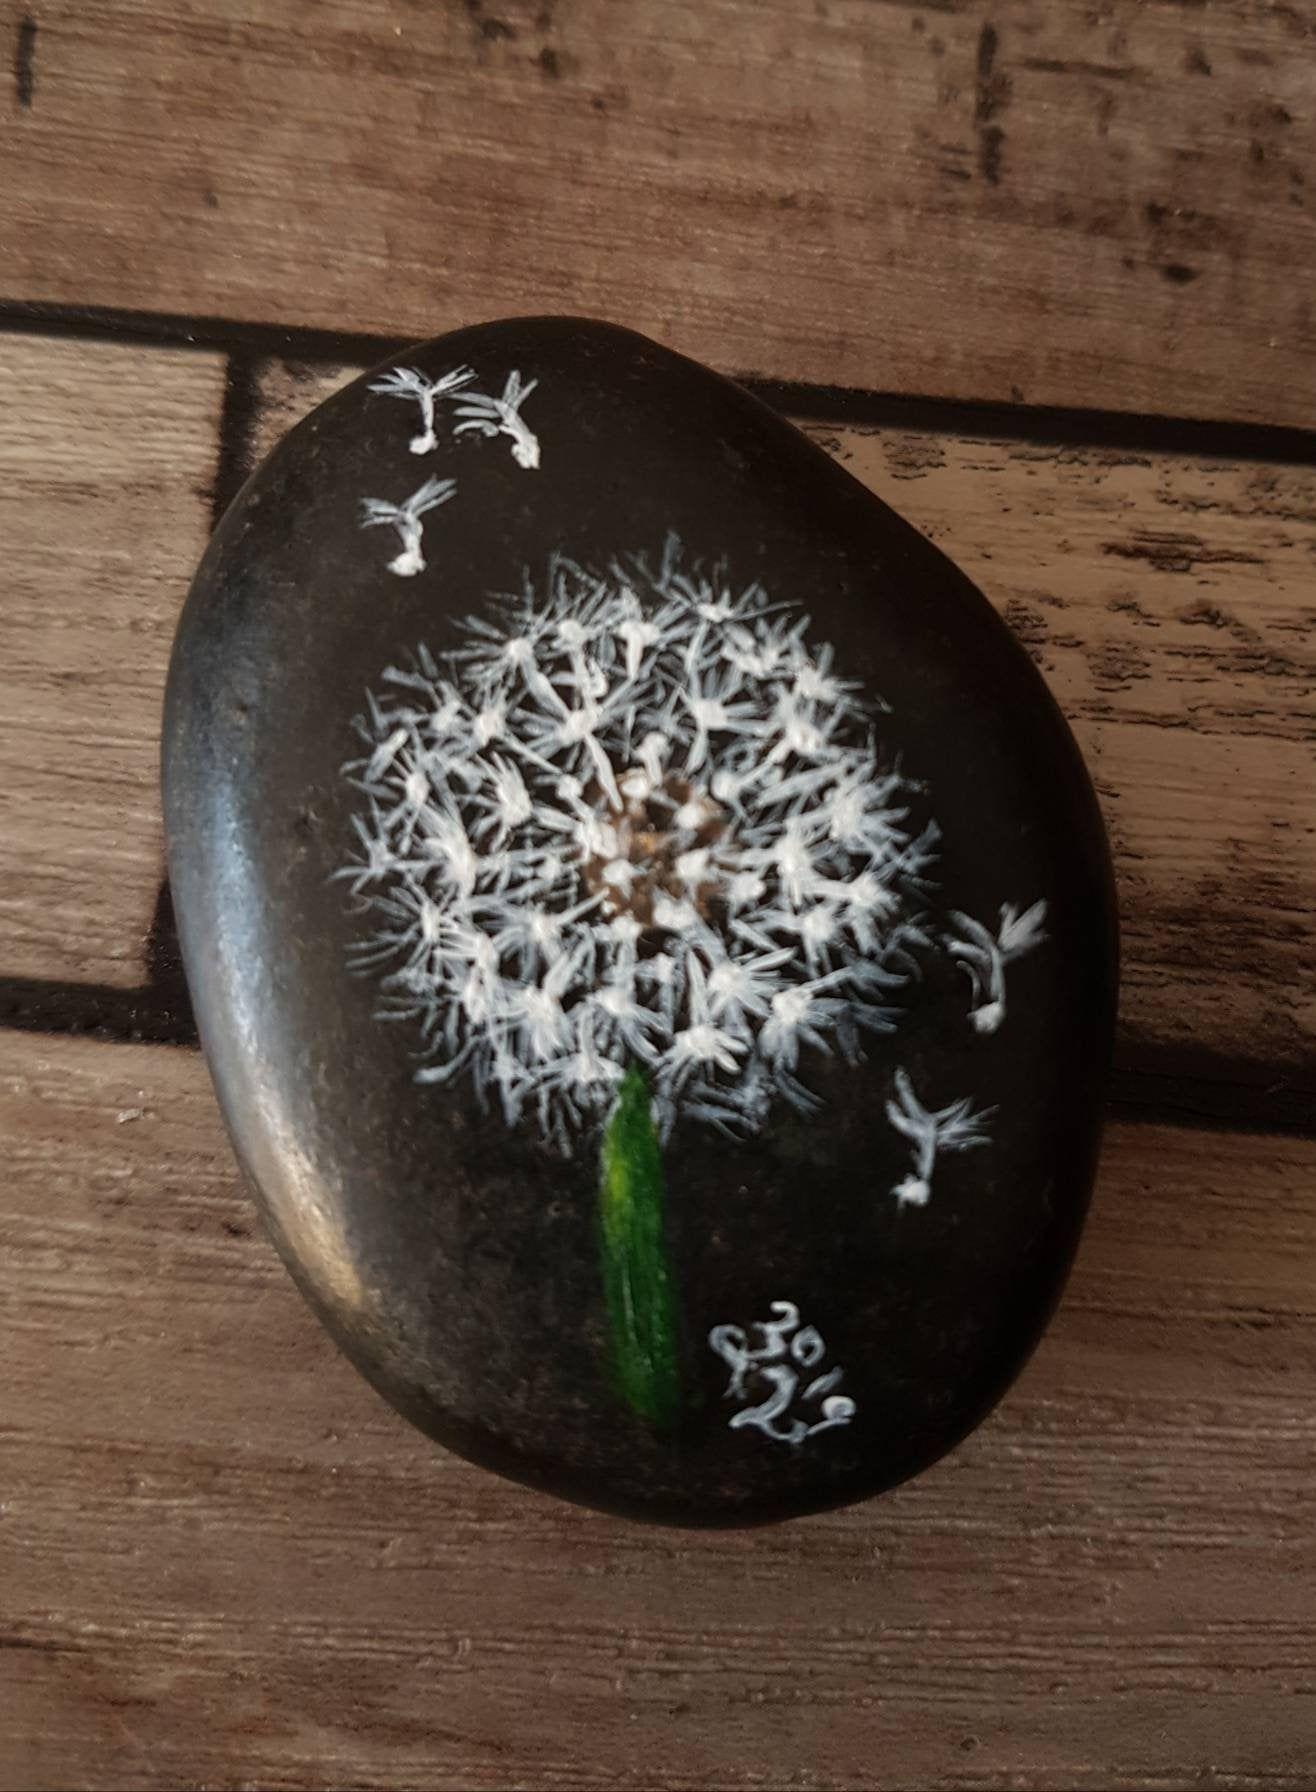 Bemalter Stein Pusteblume, painted rocks, Kieselsteinkunst, Rockart, handbemalte Kieselsteine, Pusteblumen, Herbst, Winter, bemalte Steine #bemaltekieselsteine